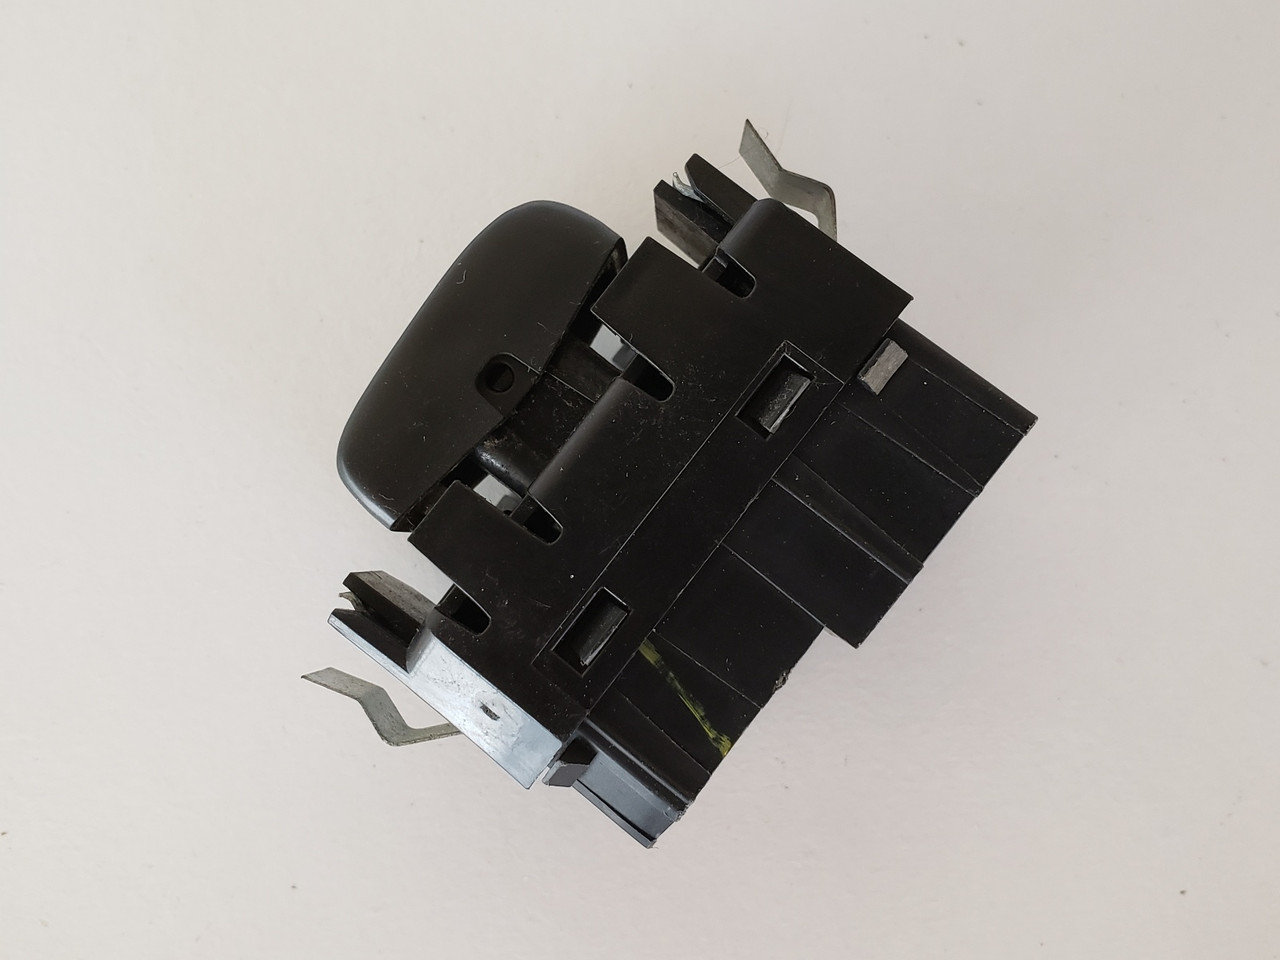 02-05 Chevy Trailblazer 15095181 Left / Right Rear Passenger Window Switch OEM